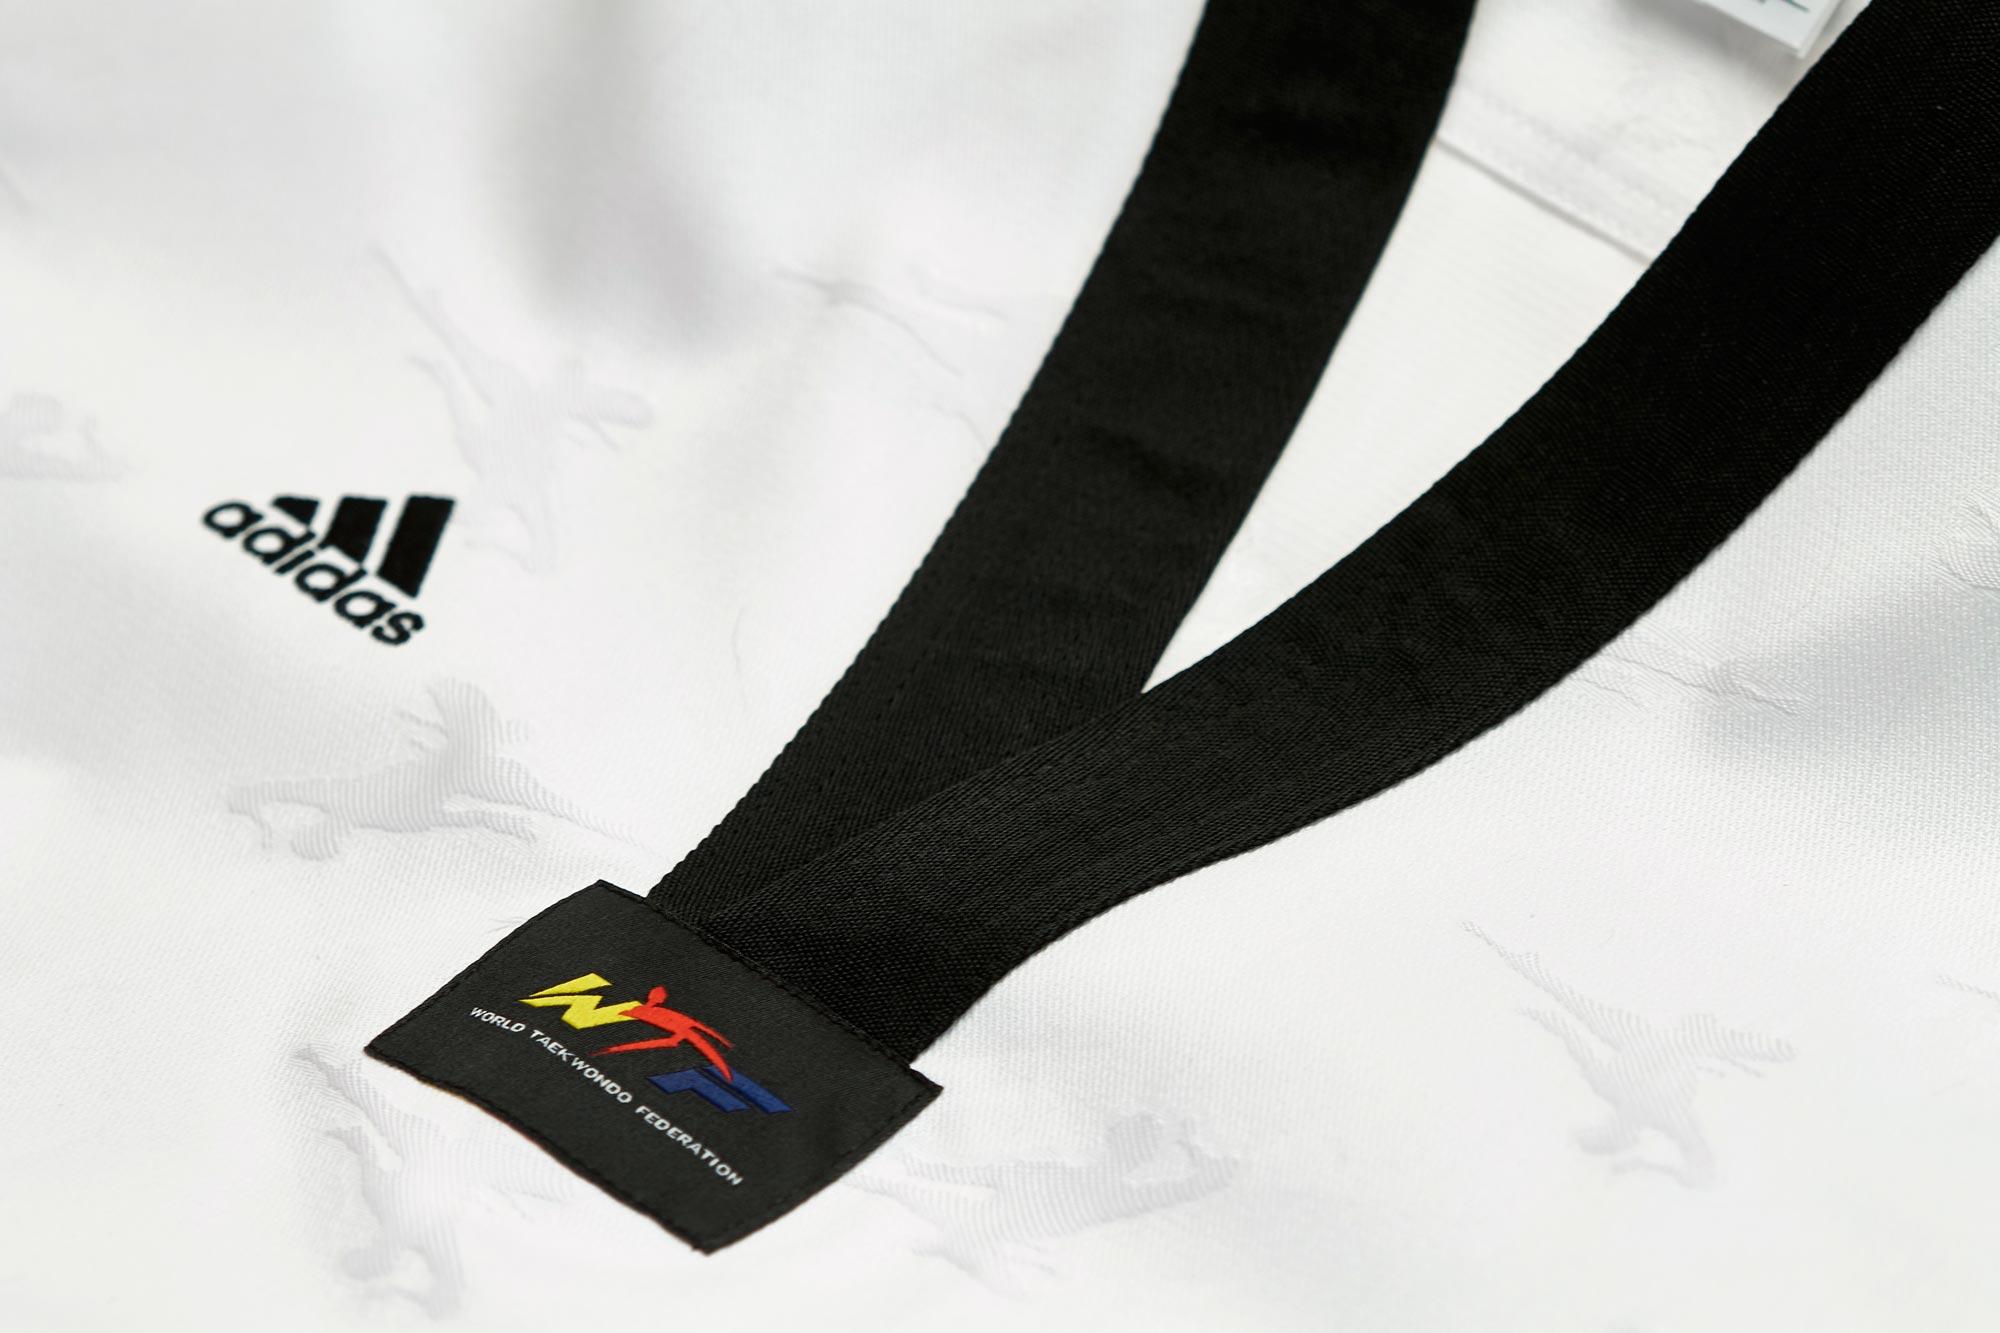 adidas Taekwondoanzug, Supermaster II, ADITSM01